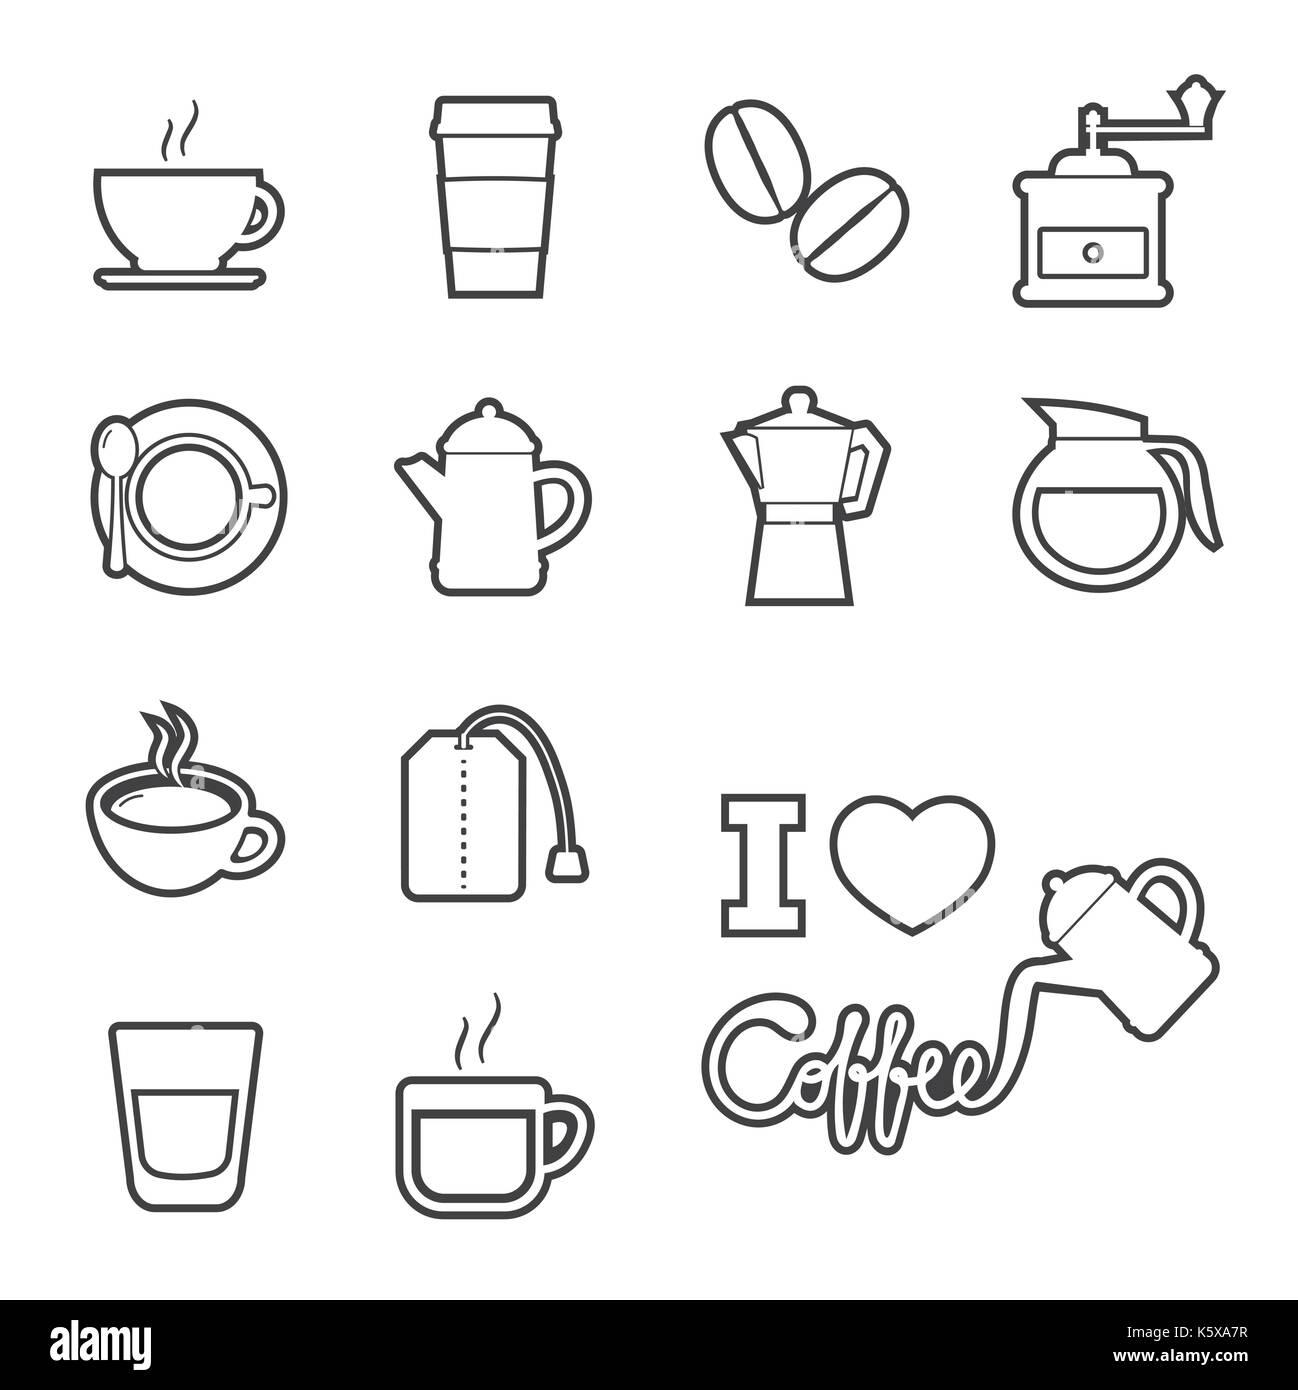 coffee and tea icon - Stock Image